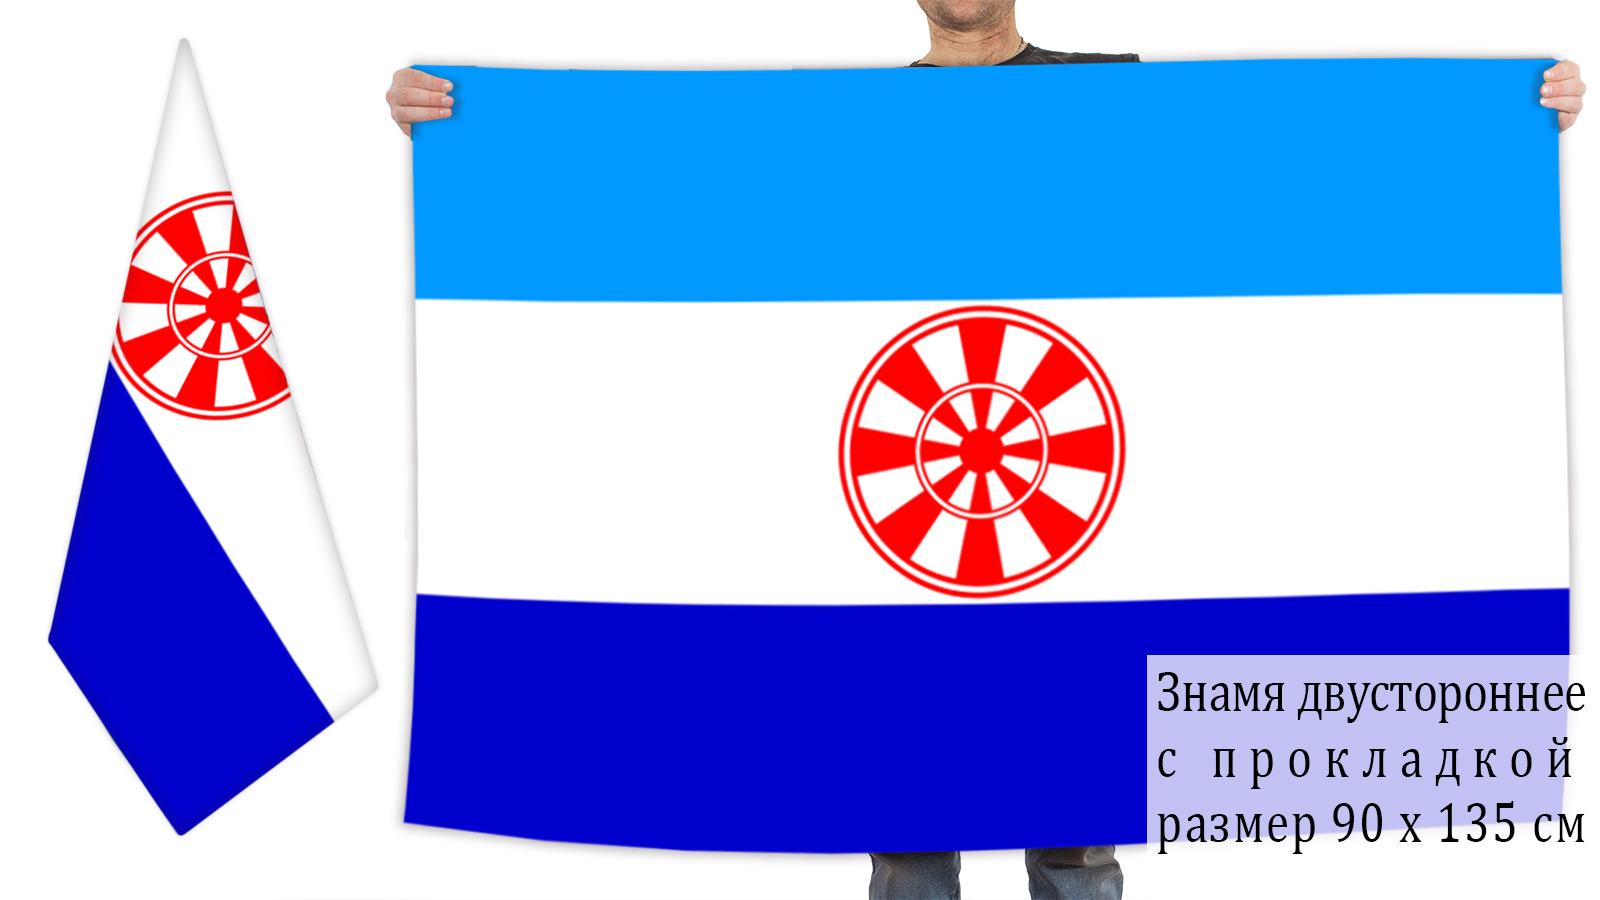 Двусторонний флаг Эвенкийского района